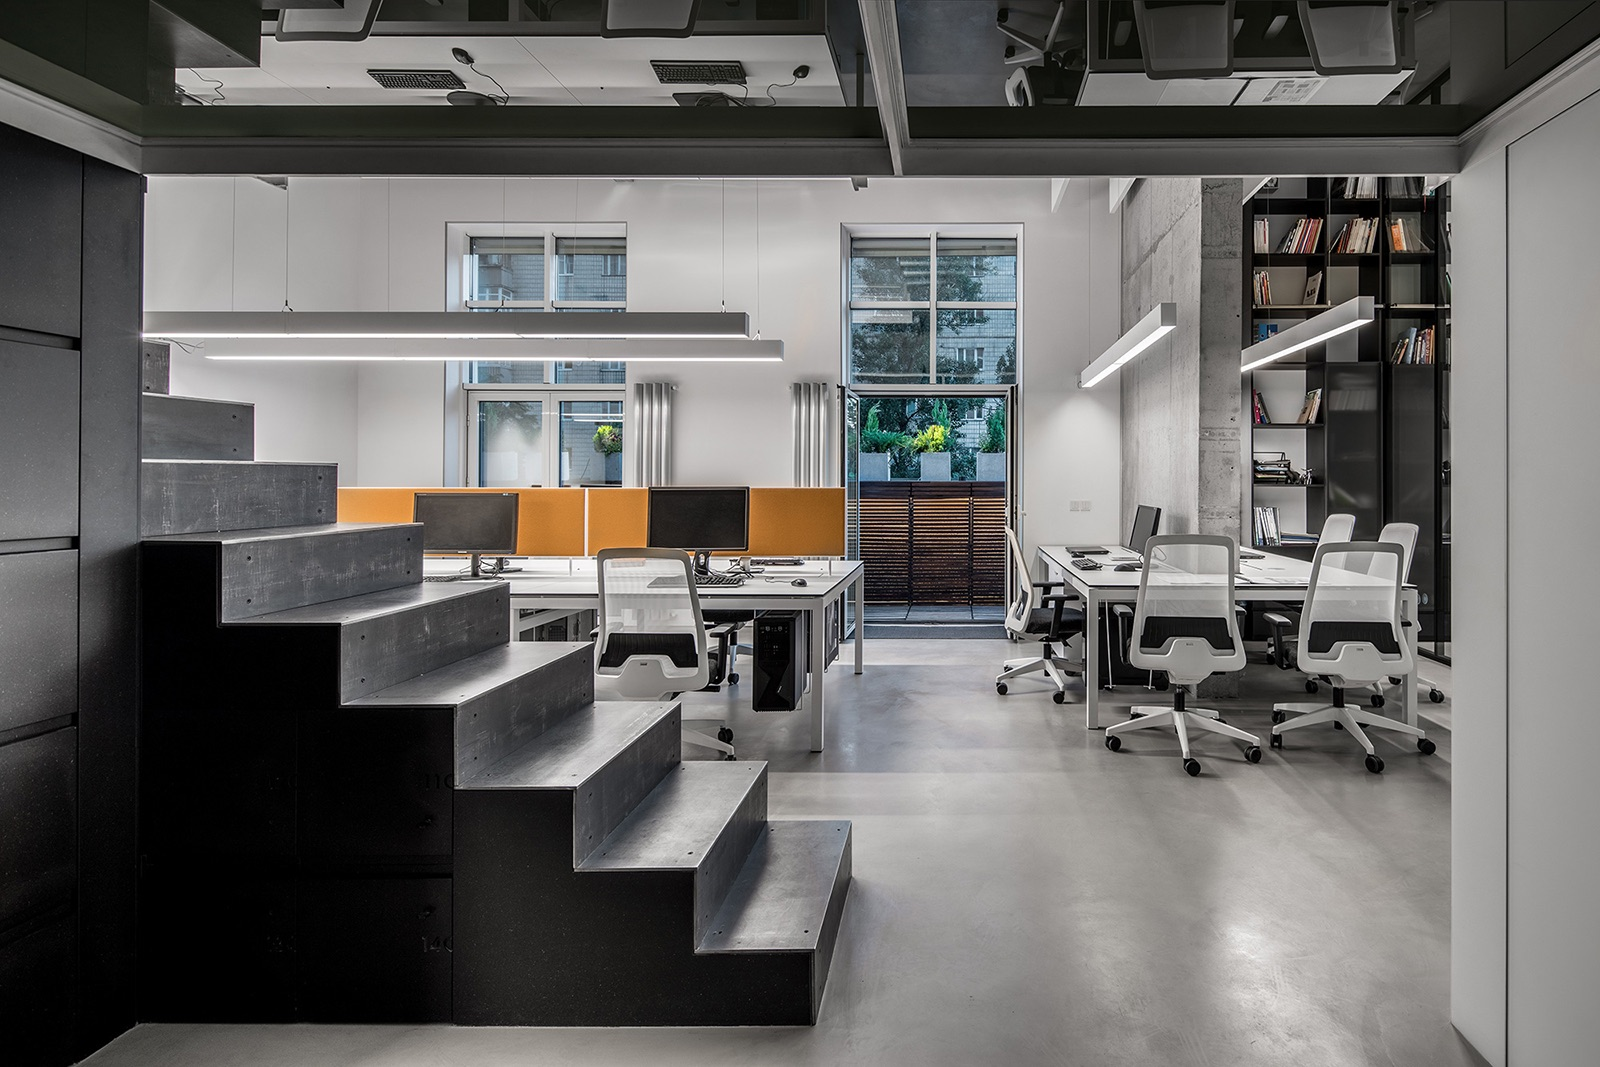 yod-design-lab-office-11